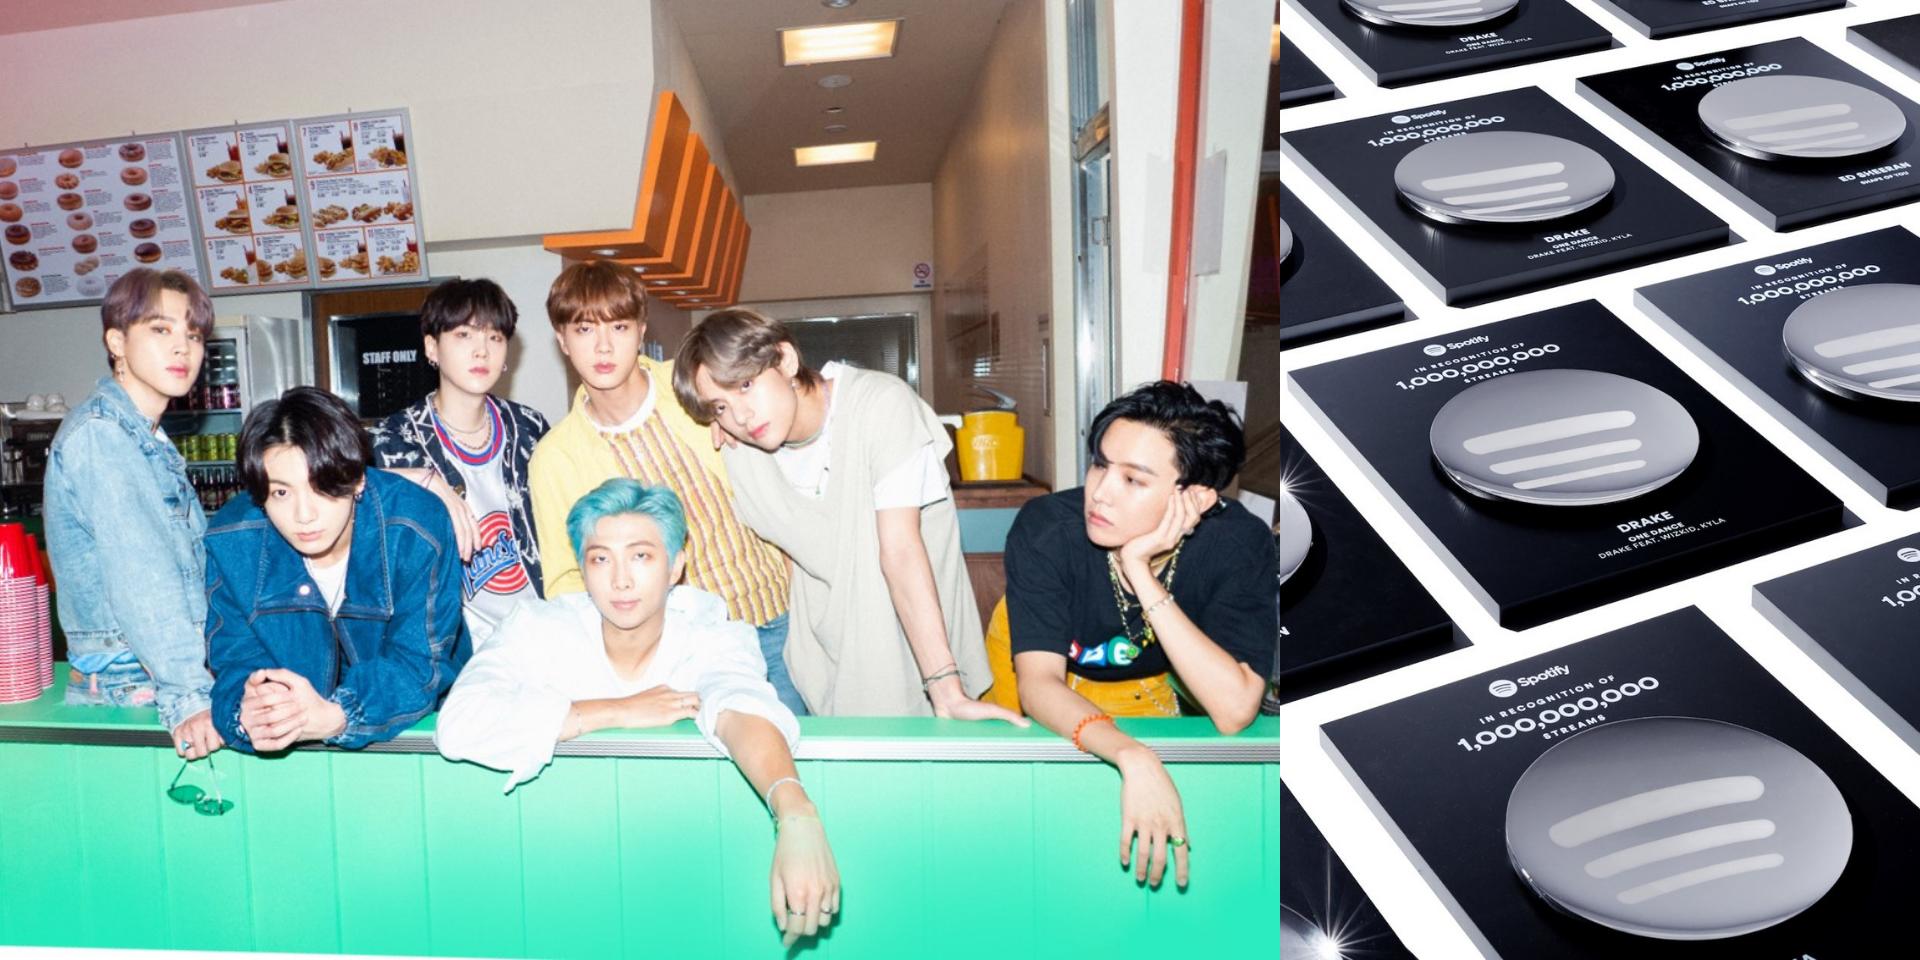 BTS' 'Dynamite' joins Spotify's Billions Club with over 1 billion streams